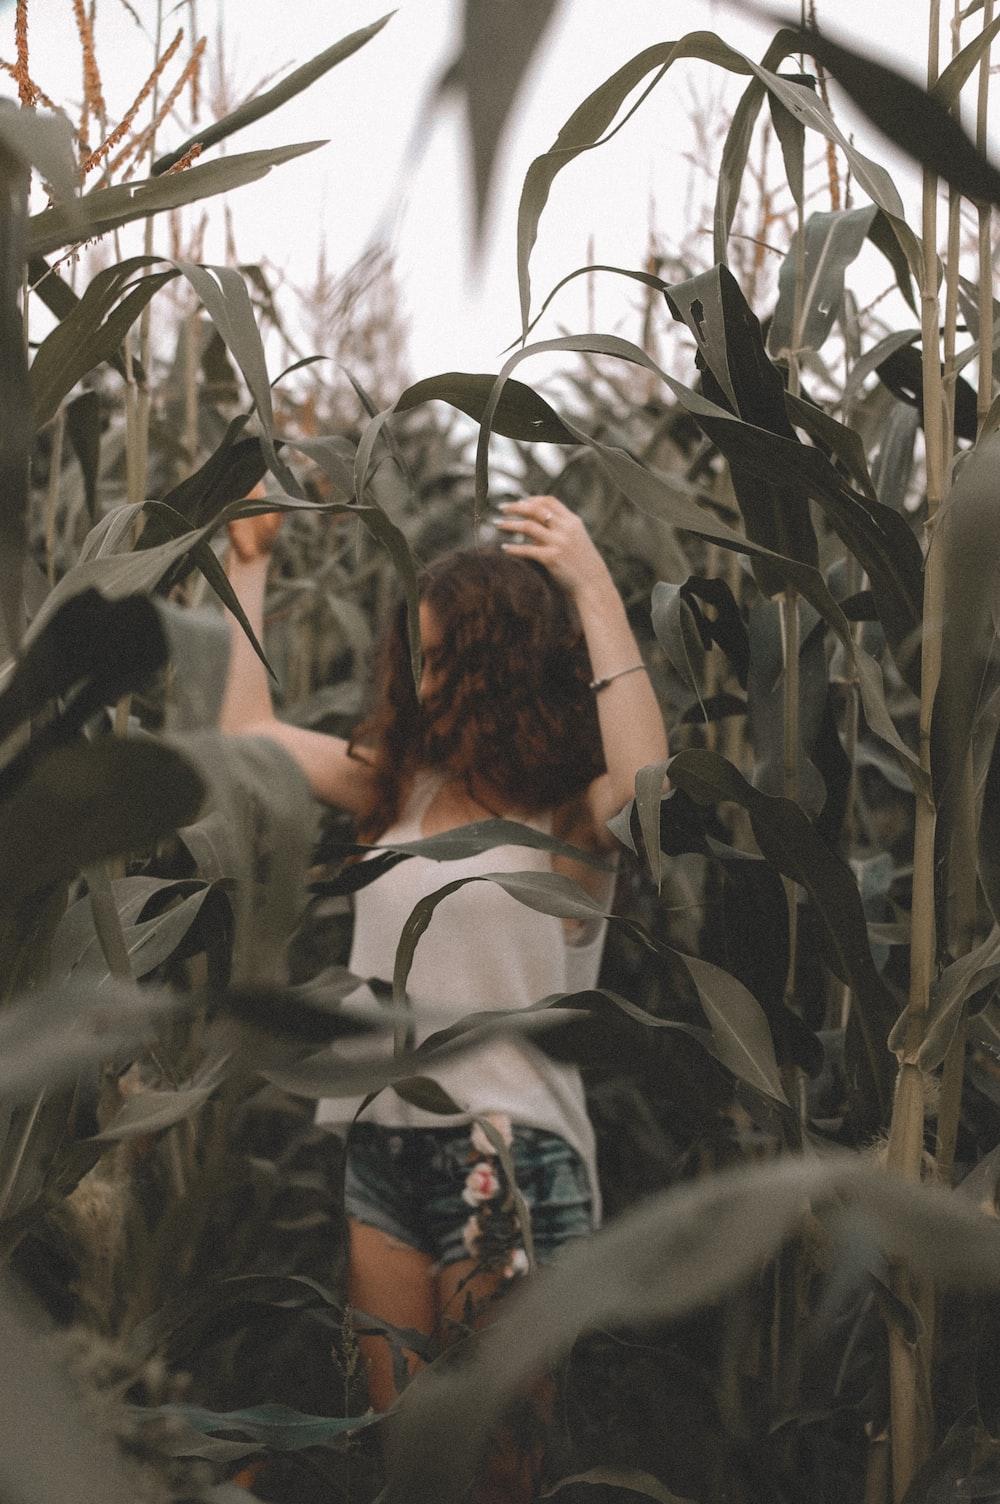 woman wearing white tank top standing among corn field